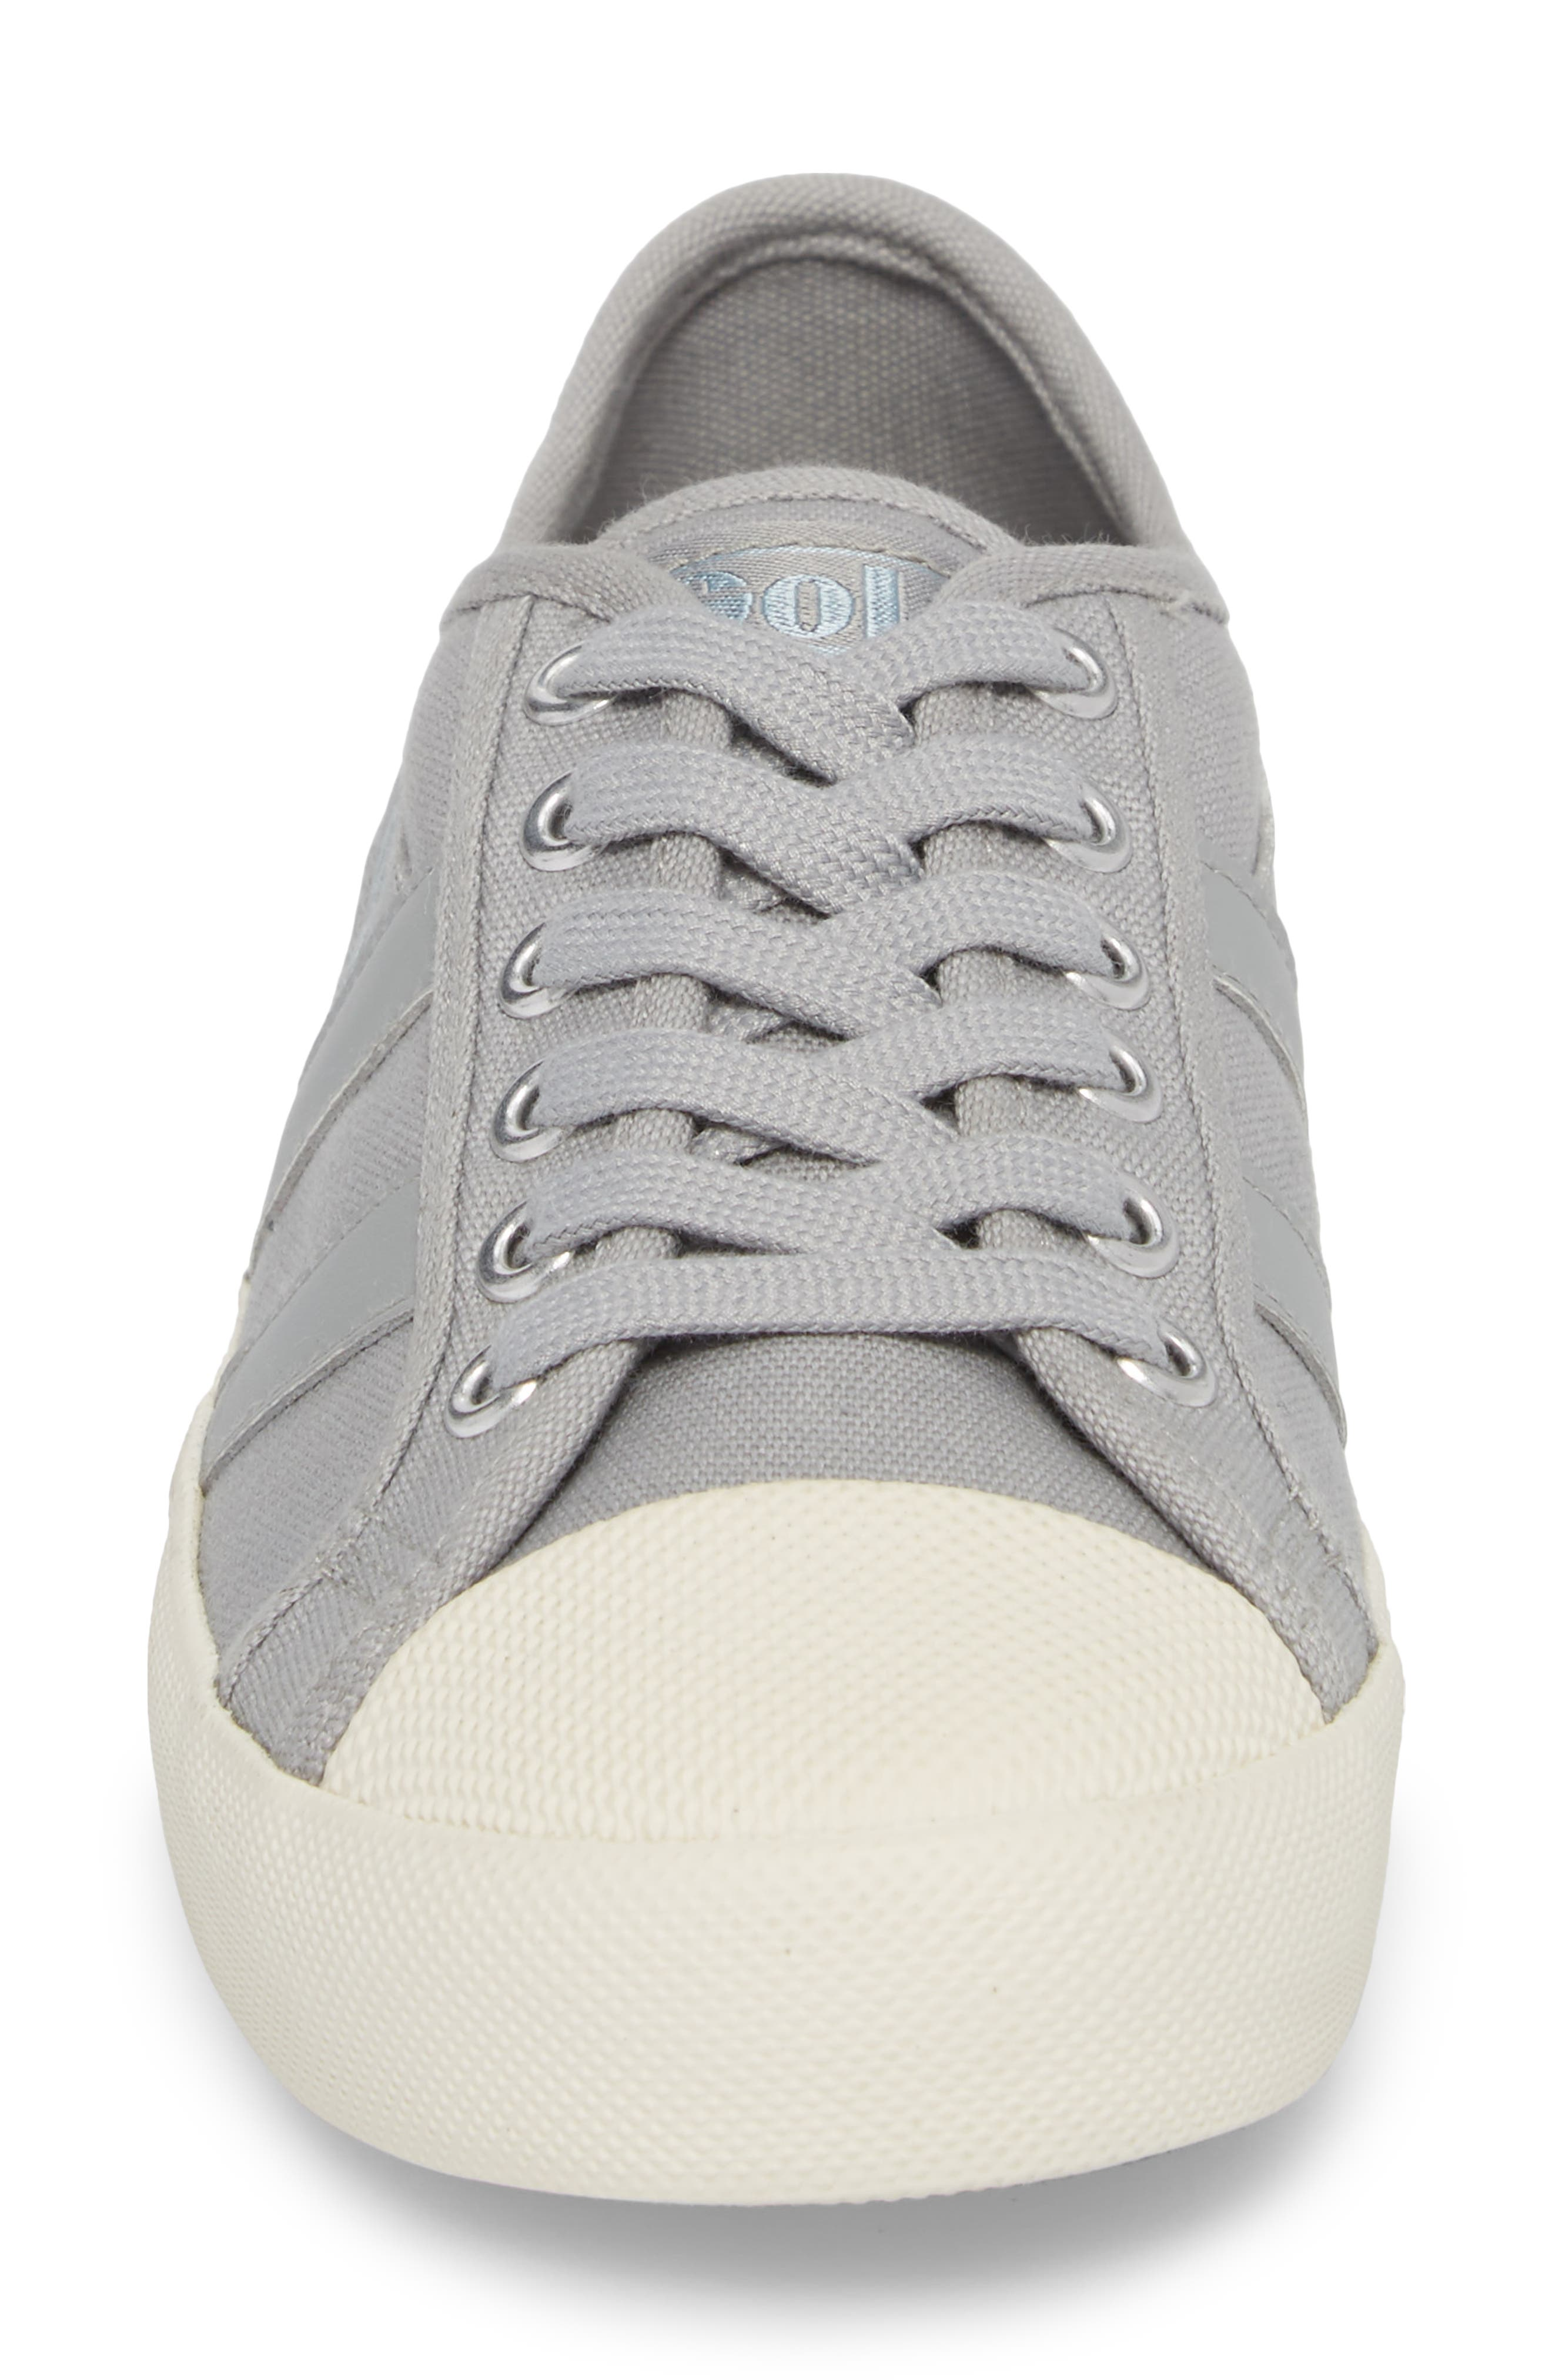 Coaster Sneaker,                             Alternate thumbnail 4, color,                             Paloma/ Off White